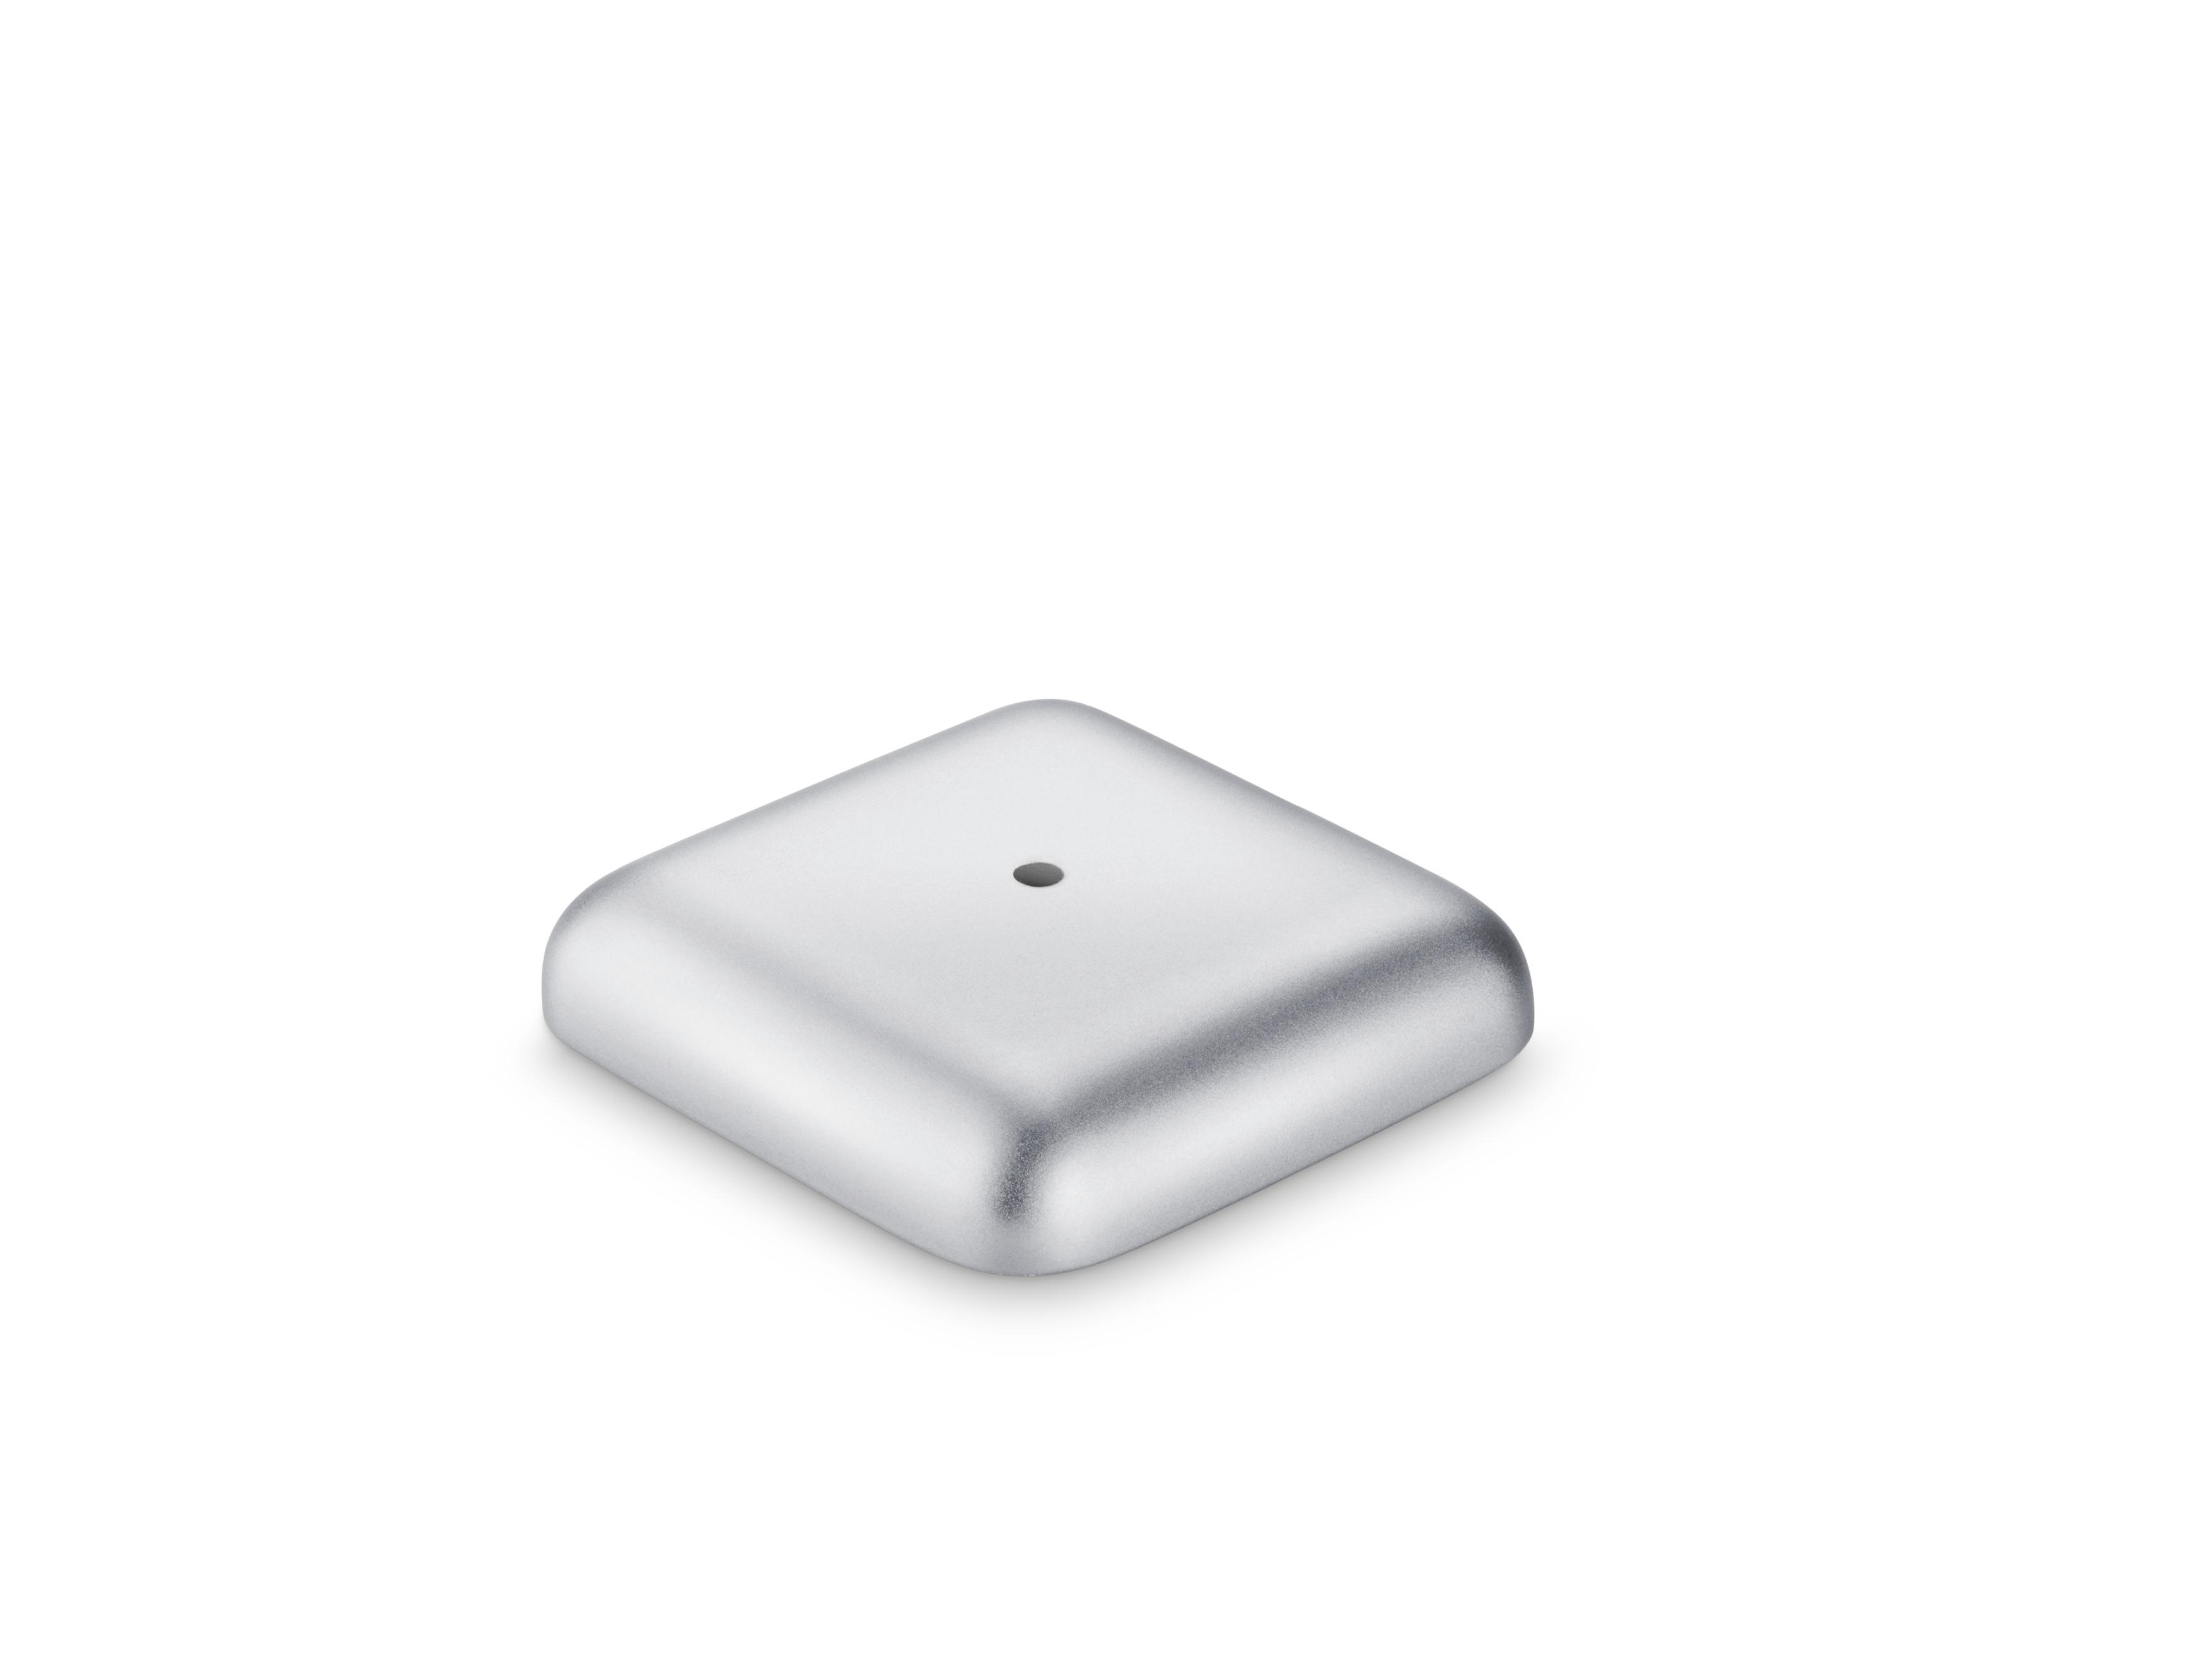 Bosch Smart Home - Universalschalter Flex